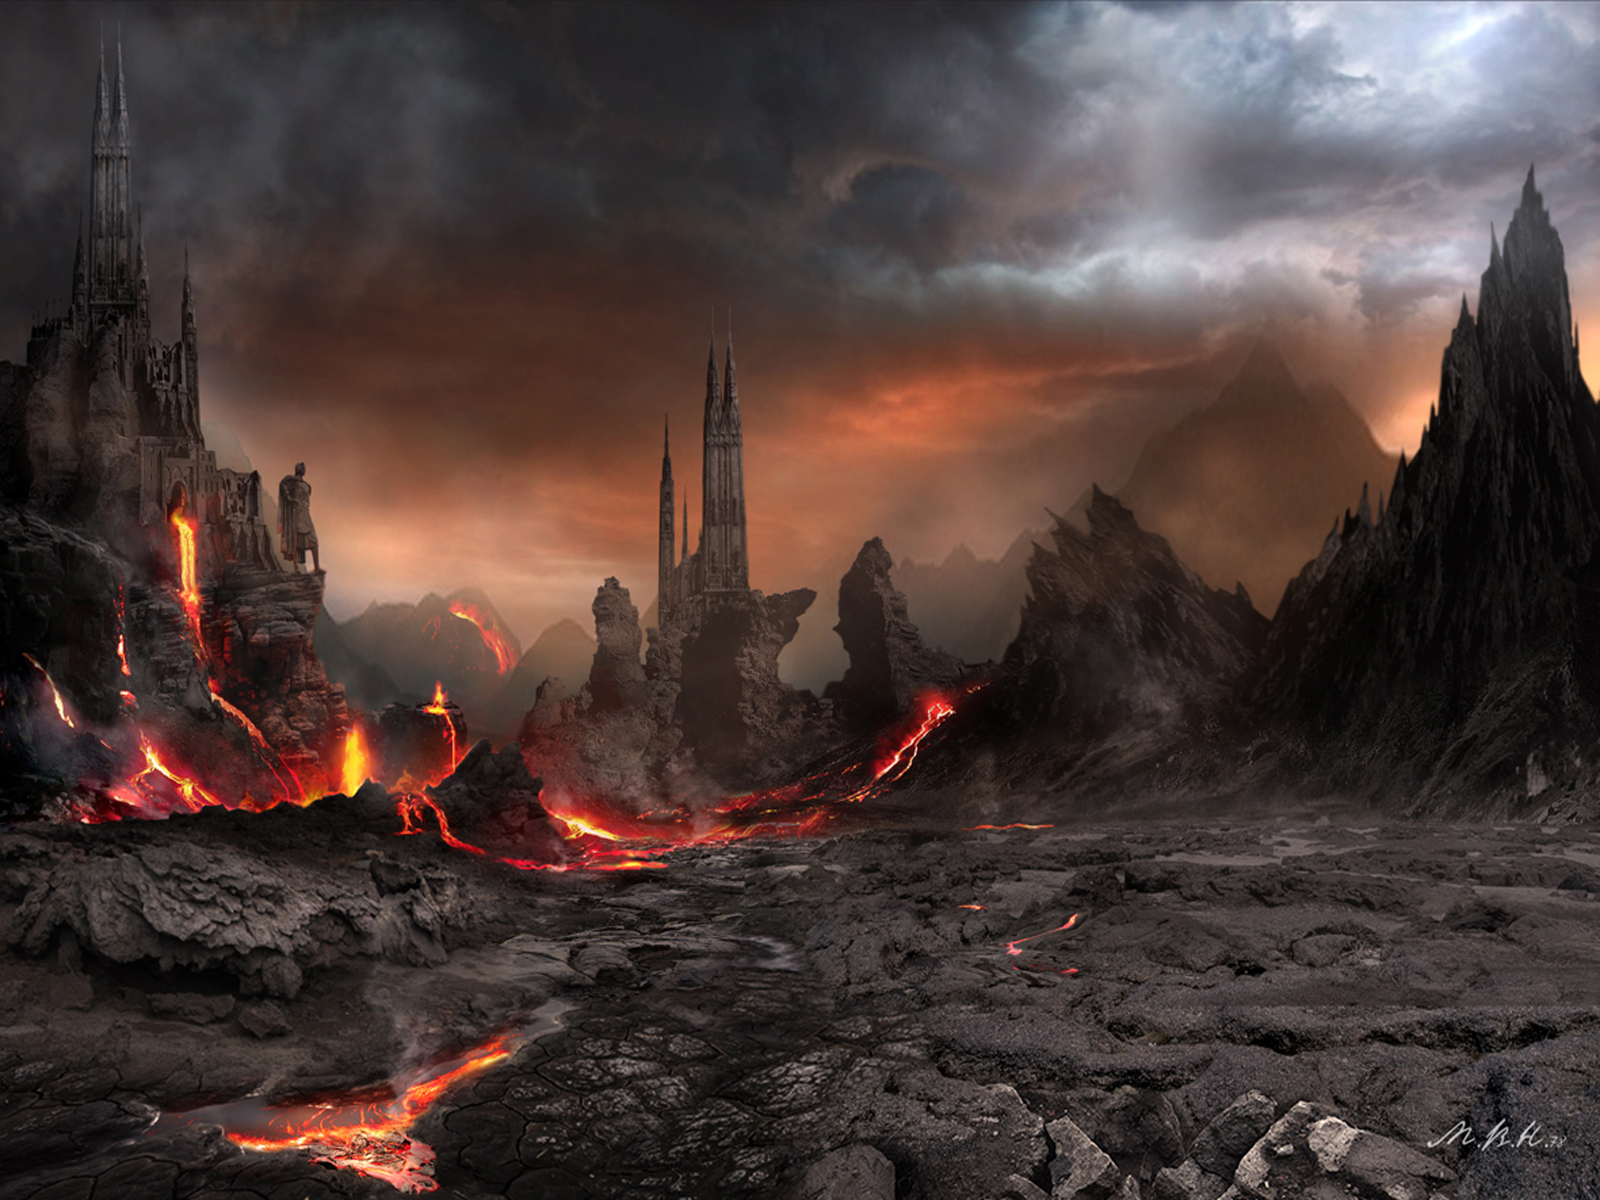 50] Post Apocalypse Wallpaper on WallpaperSafari 1600x1200